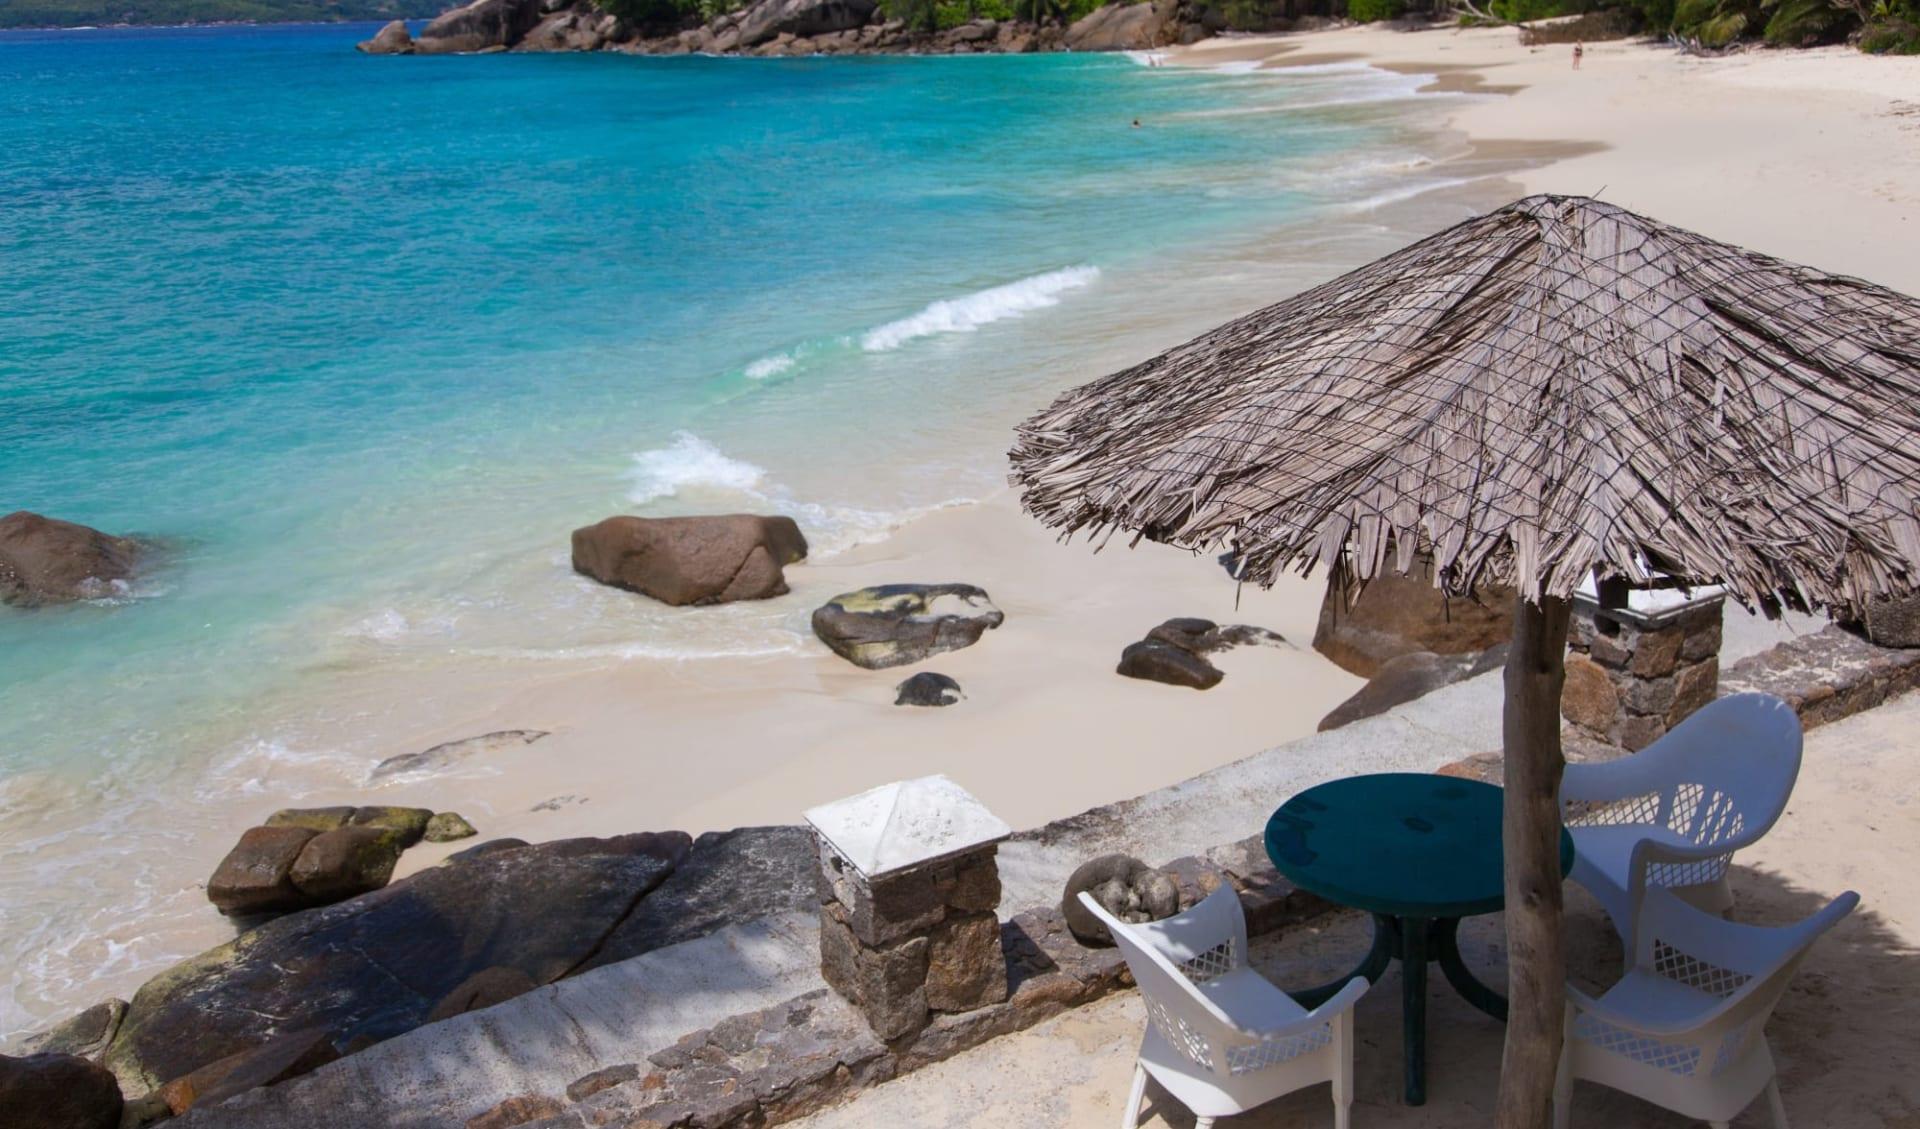 Anse Soleil Beachcomber in Mahé: